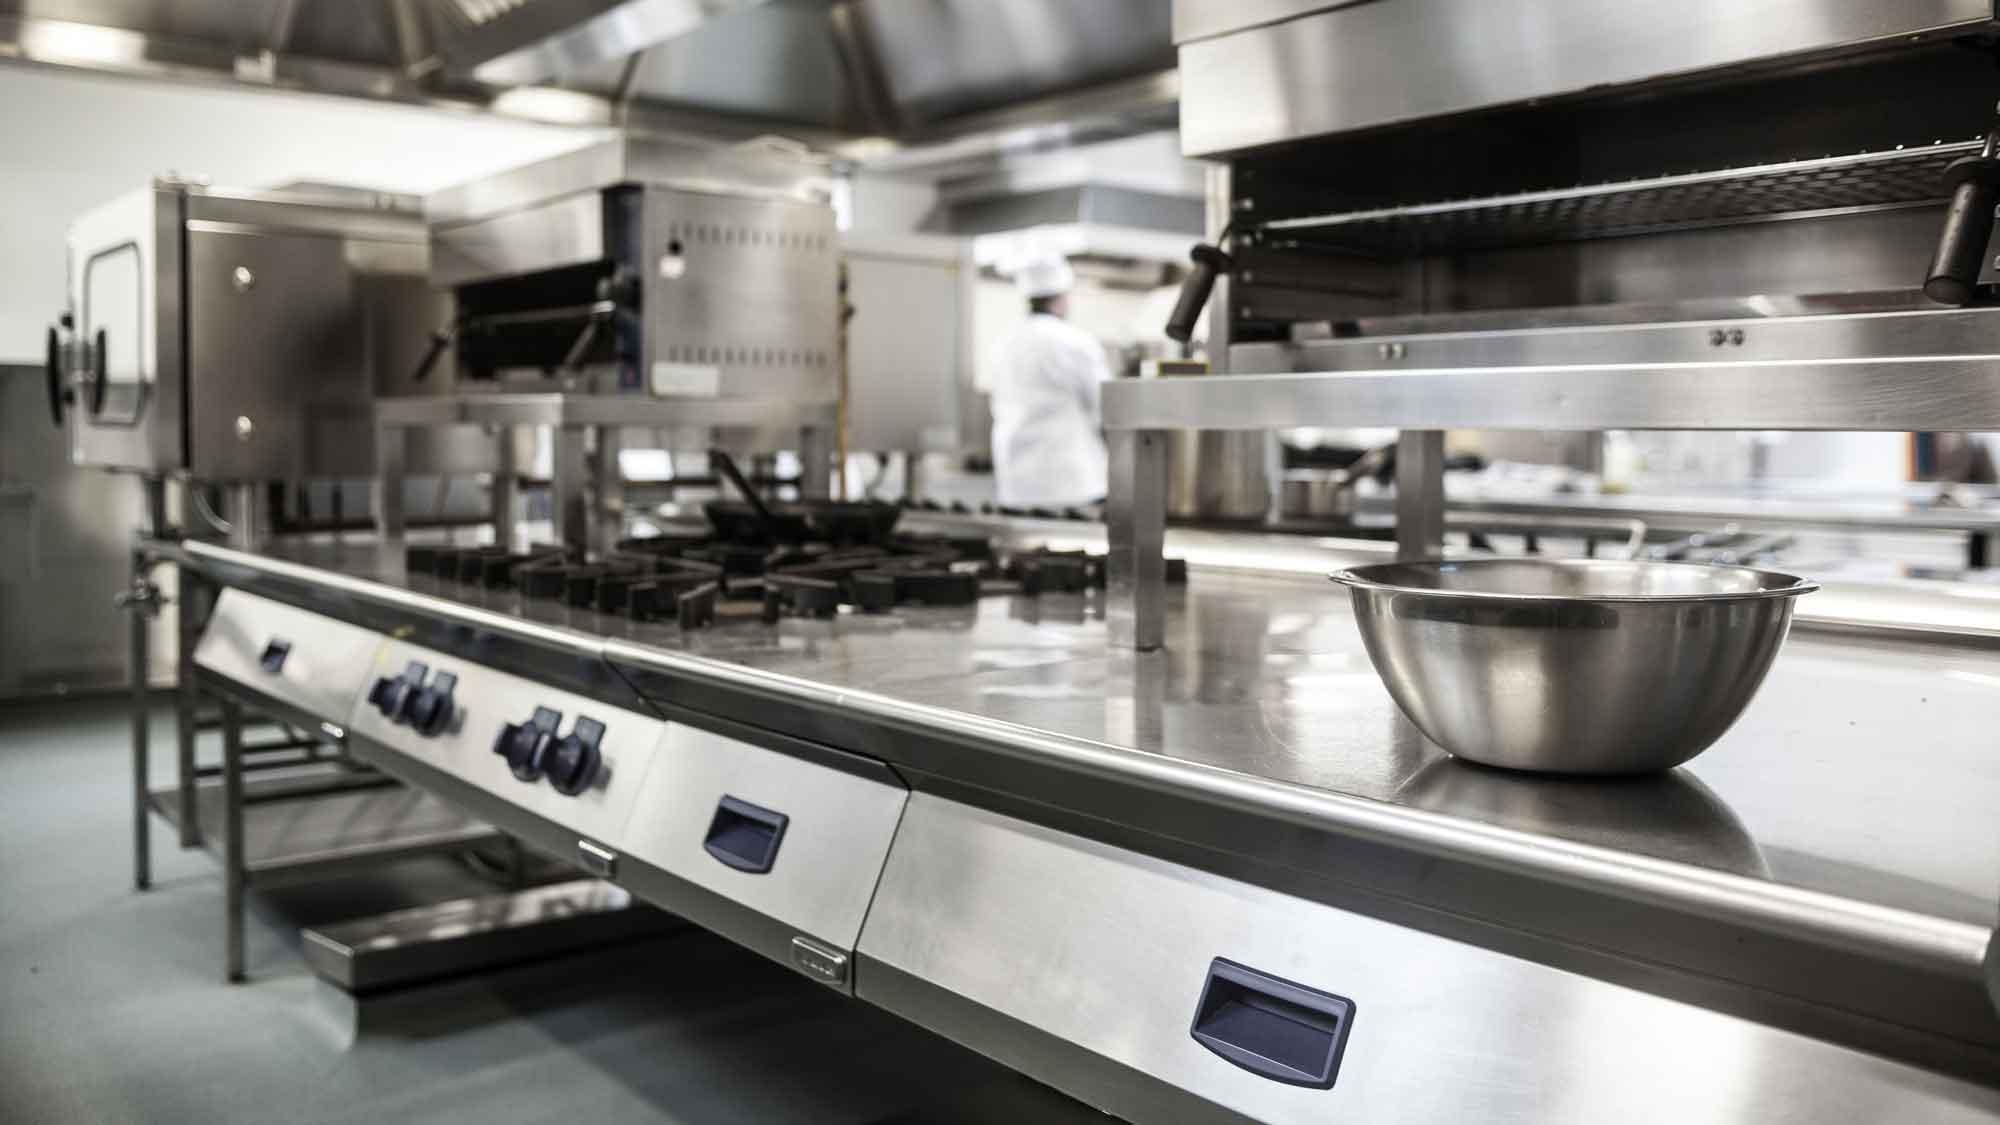 catering equipment repairs essex maintenance leigh on sea kitchen 1